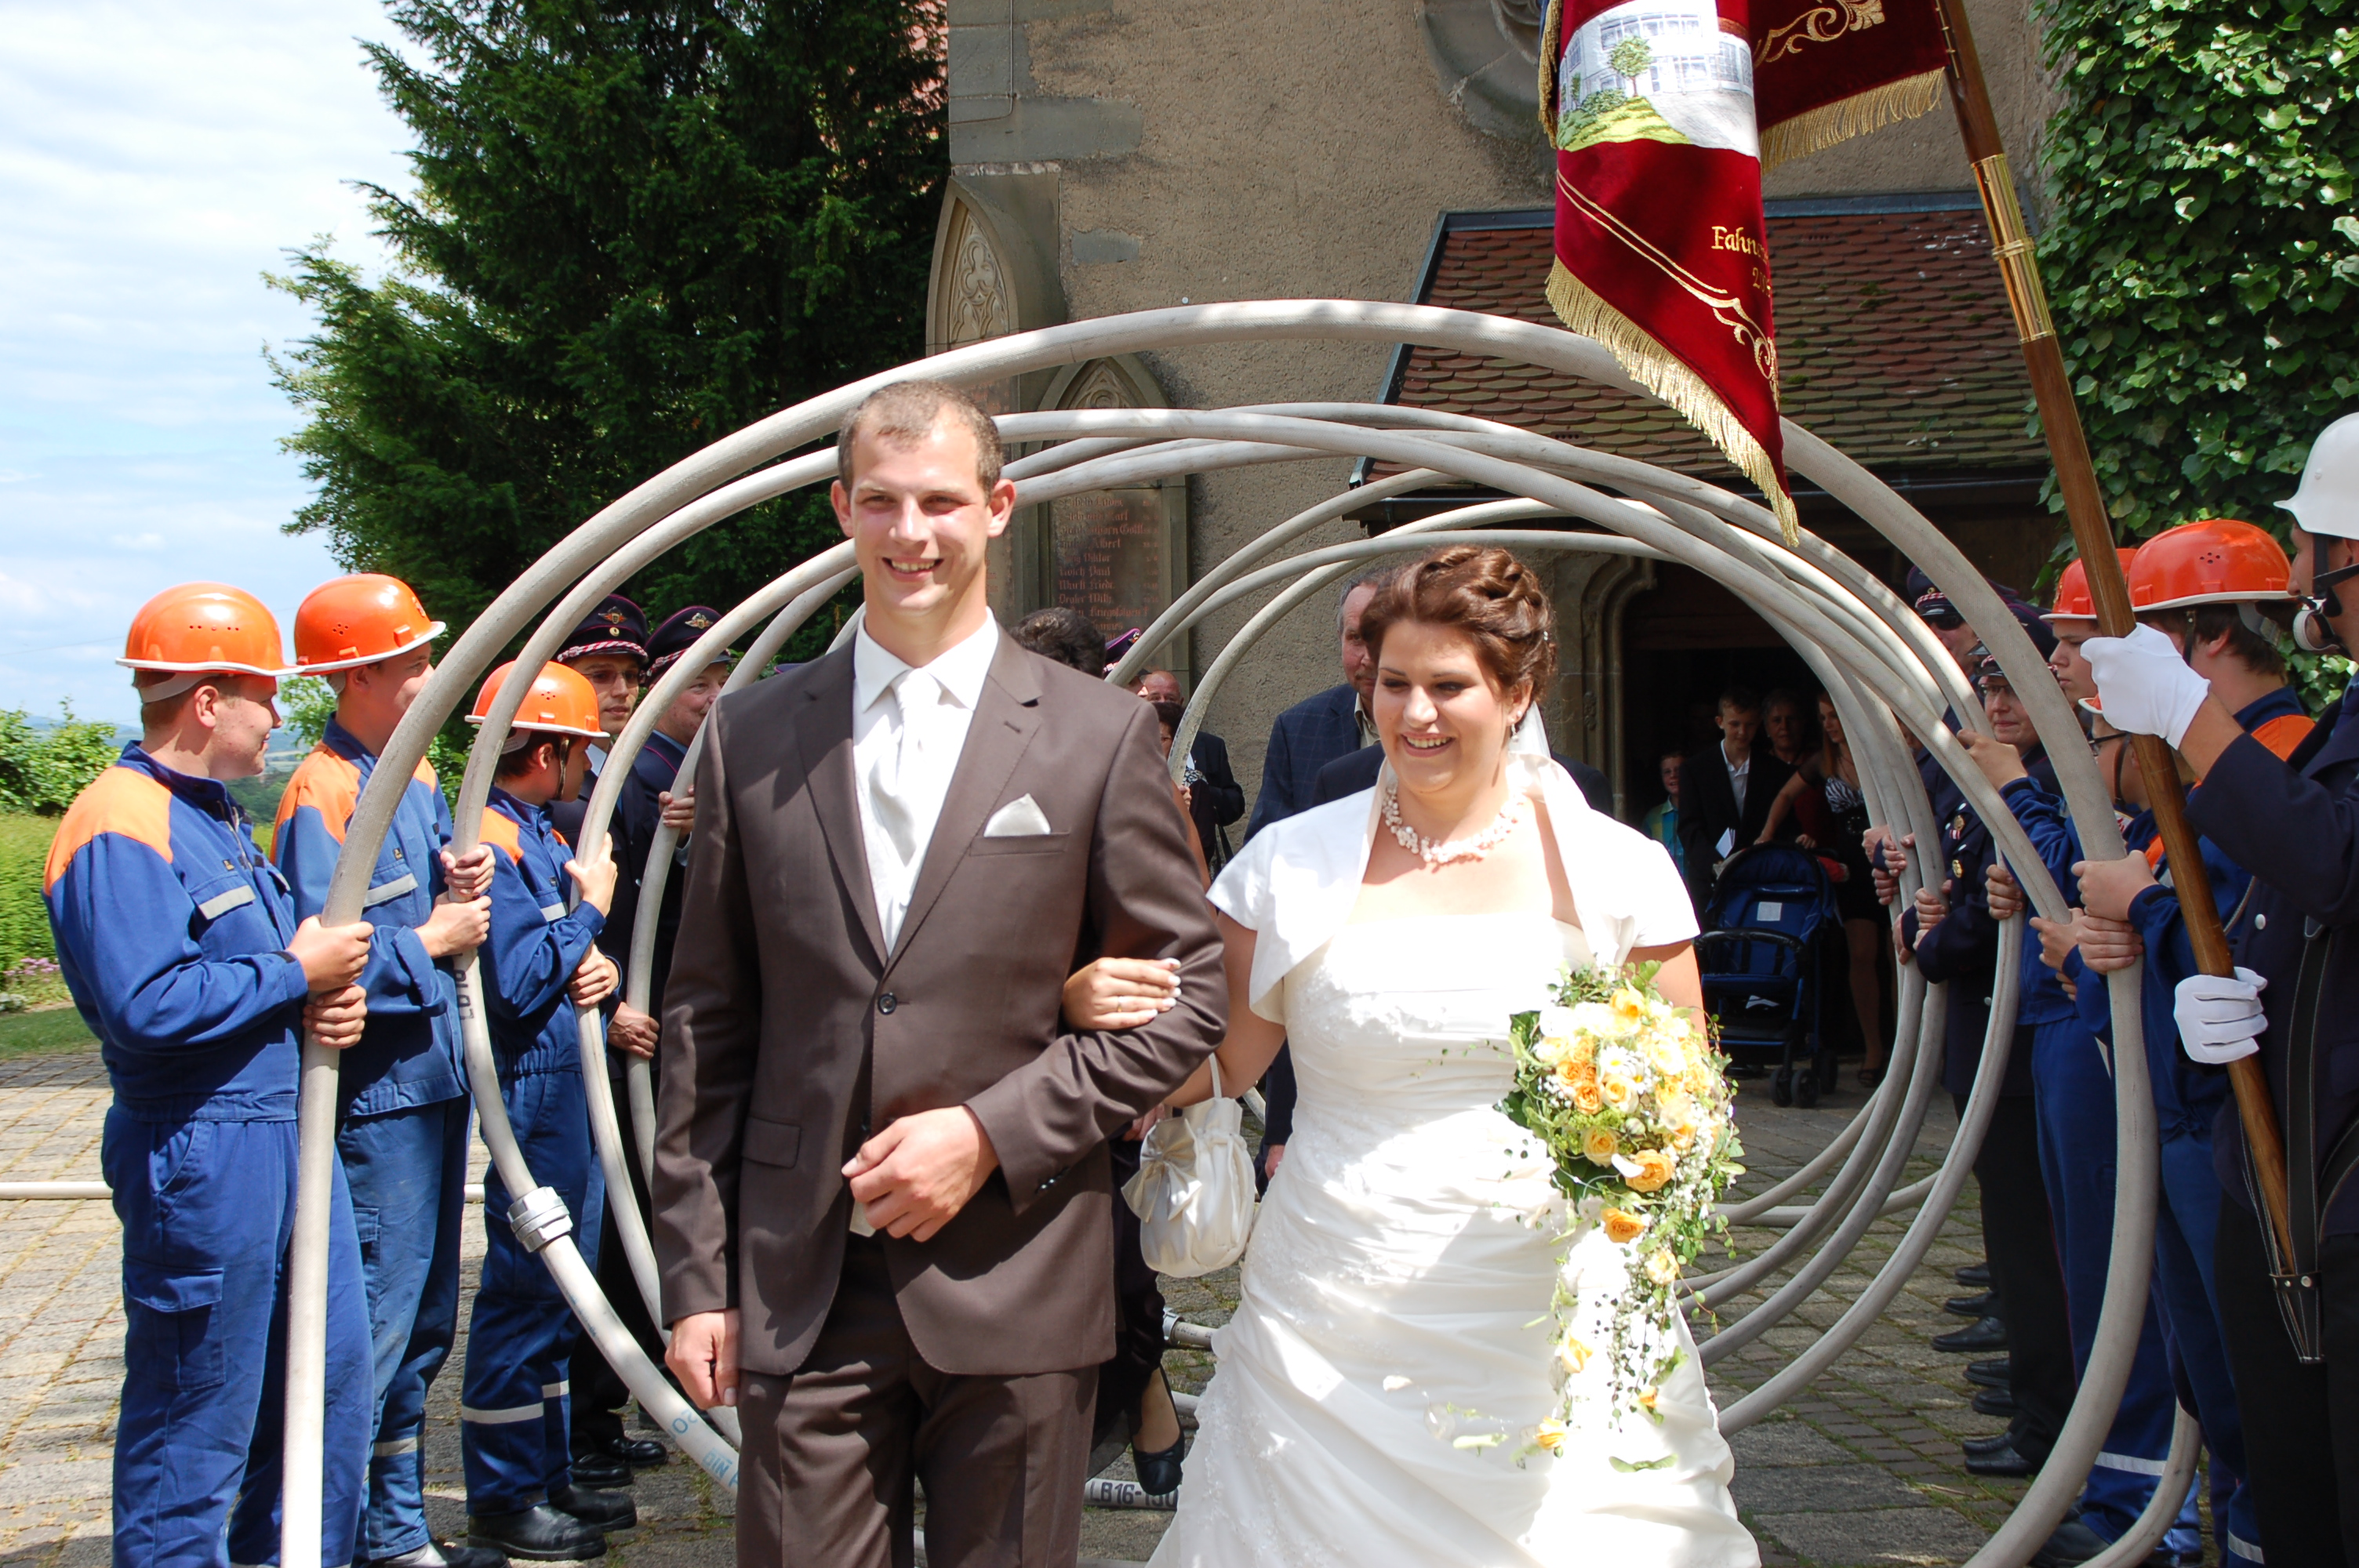 Hochtzeit Marcel und Lisa Eggert